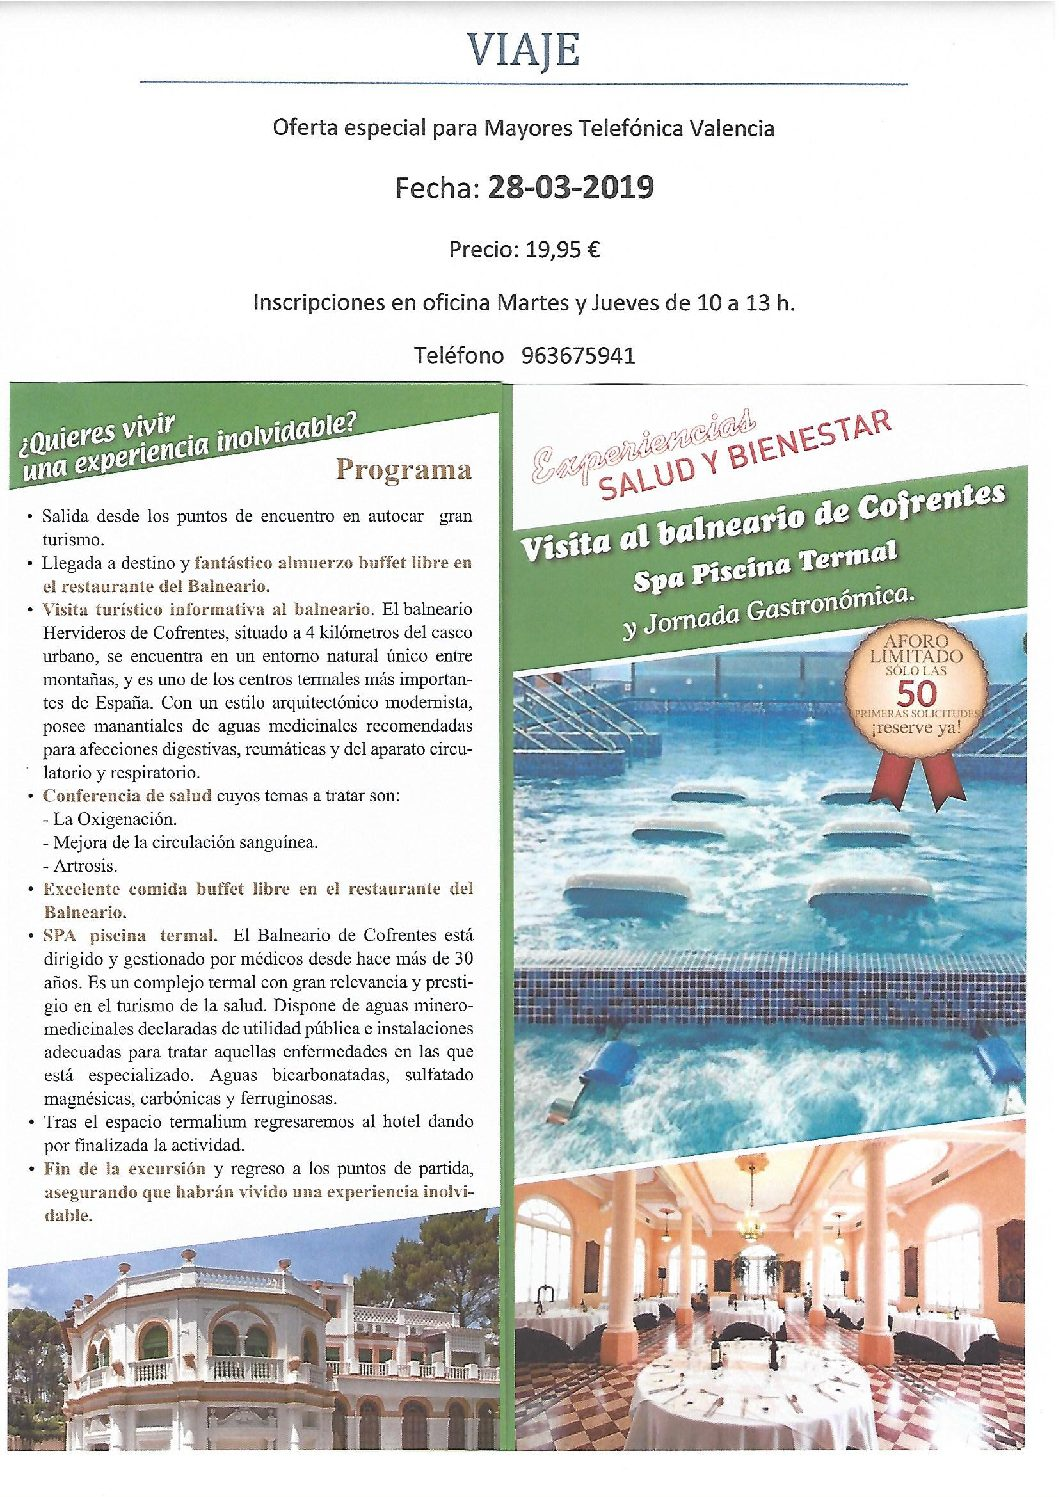 Visita al Balneario de Cofrentes 28-03-2019